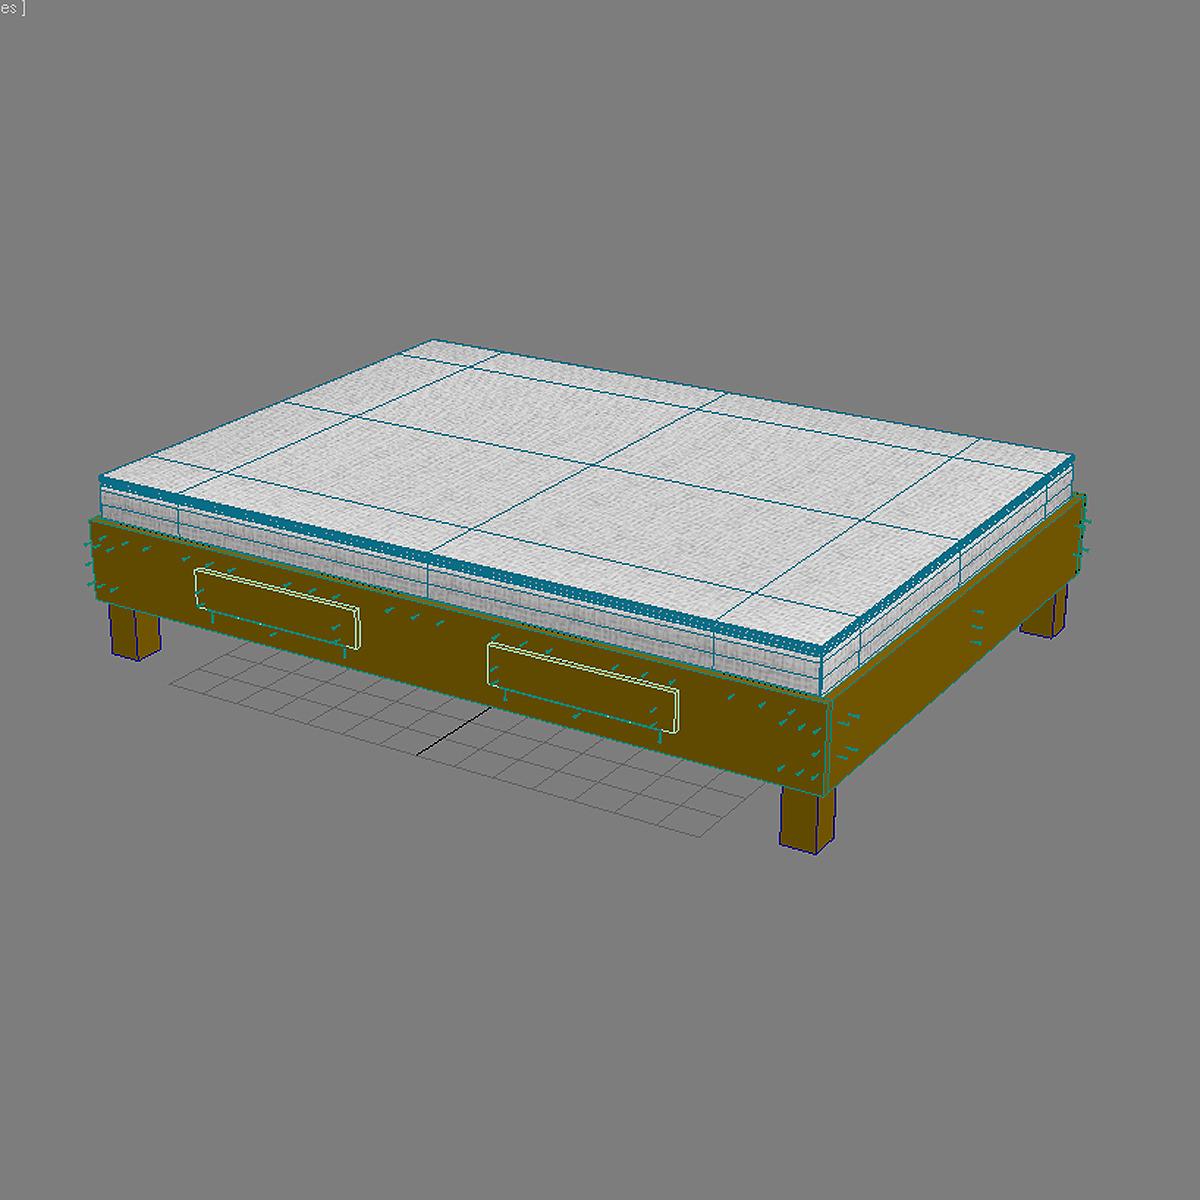 Bed max 3d model max obj 3ds fbx for 3ds max bed model